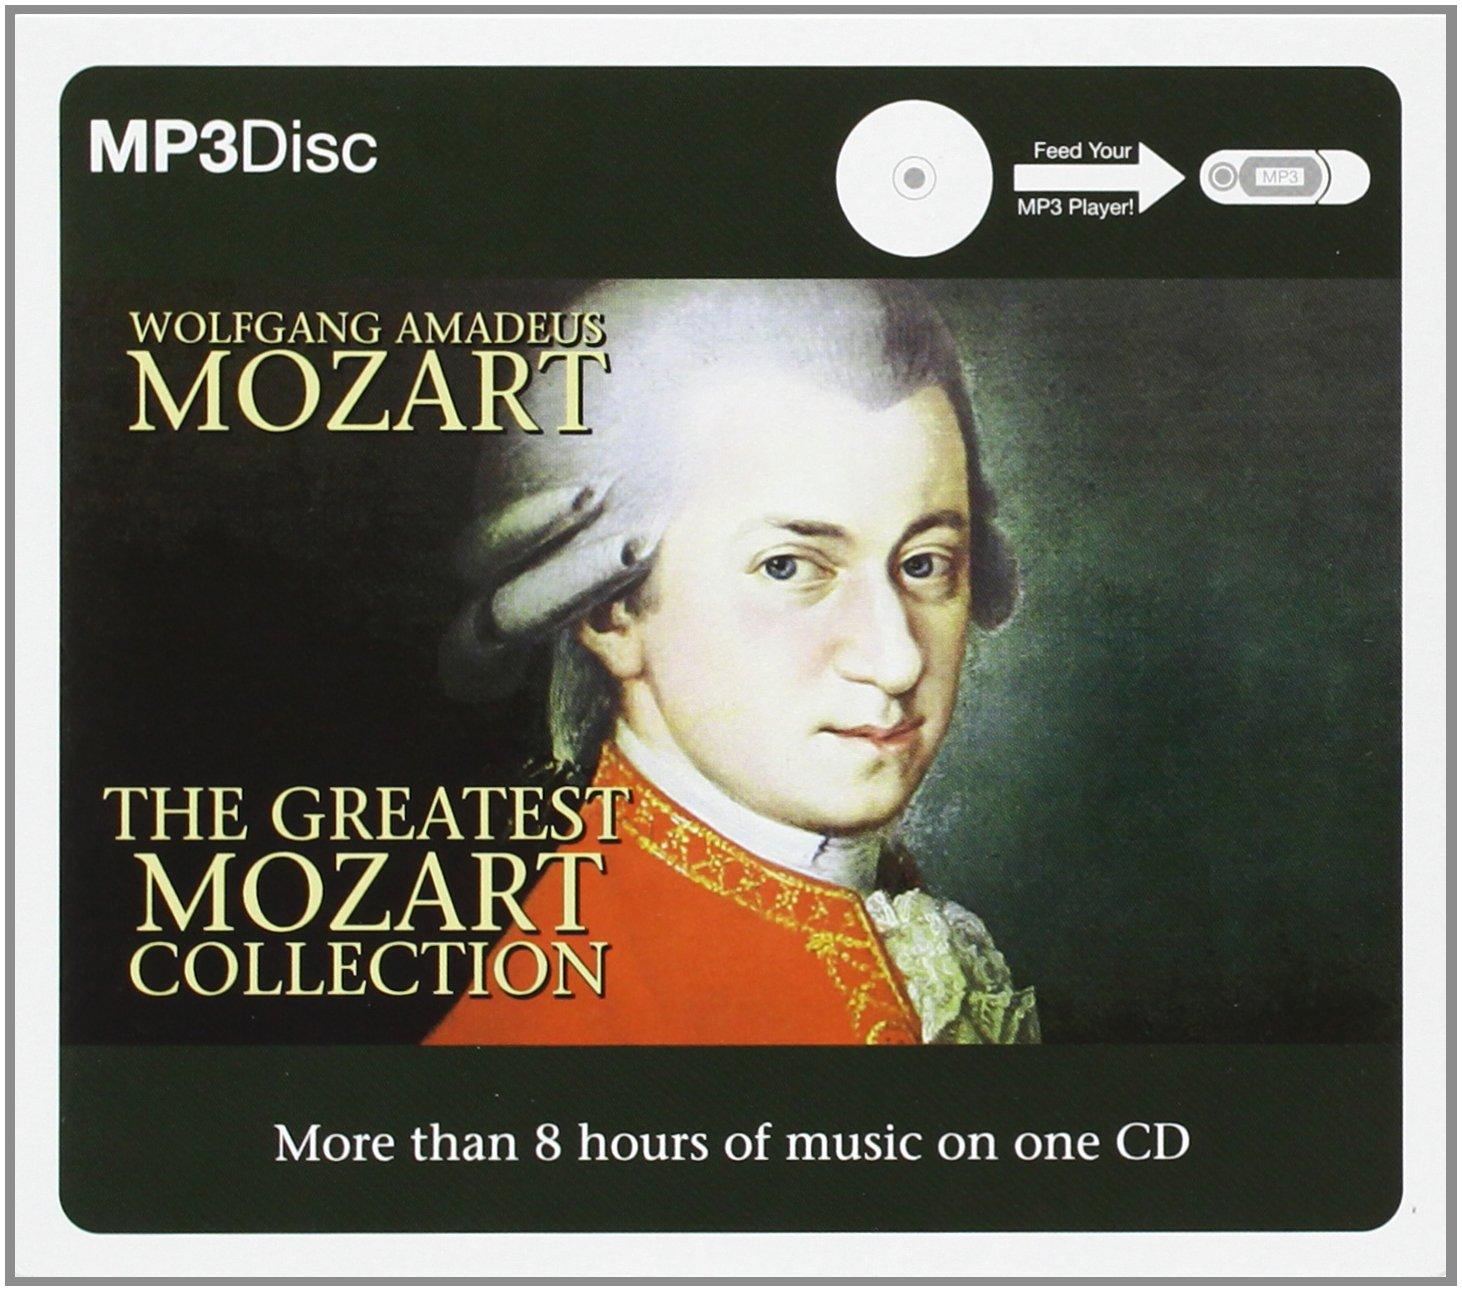 The Greatest Mozart Collection - Various, Wolfgang Amadeus Mozart:  Amazon.de: Musik